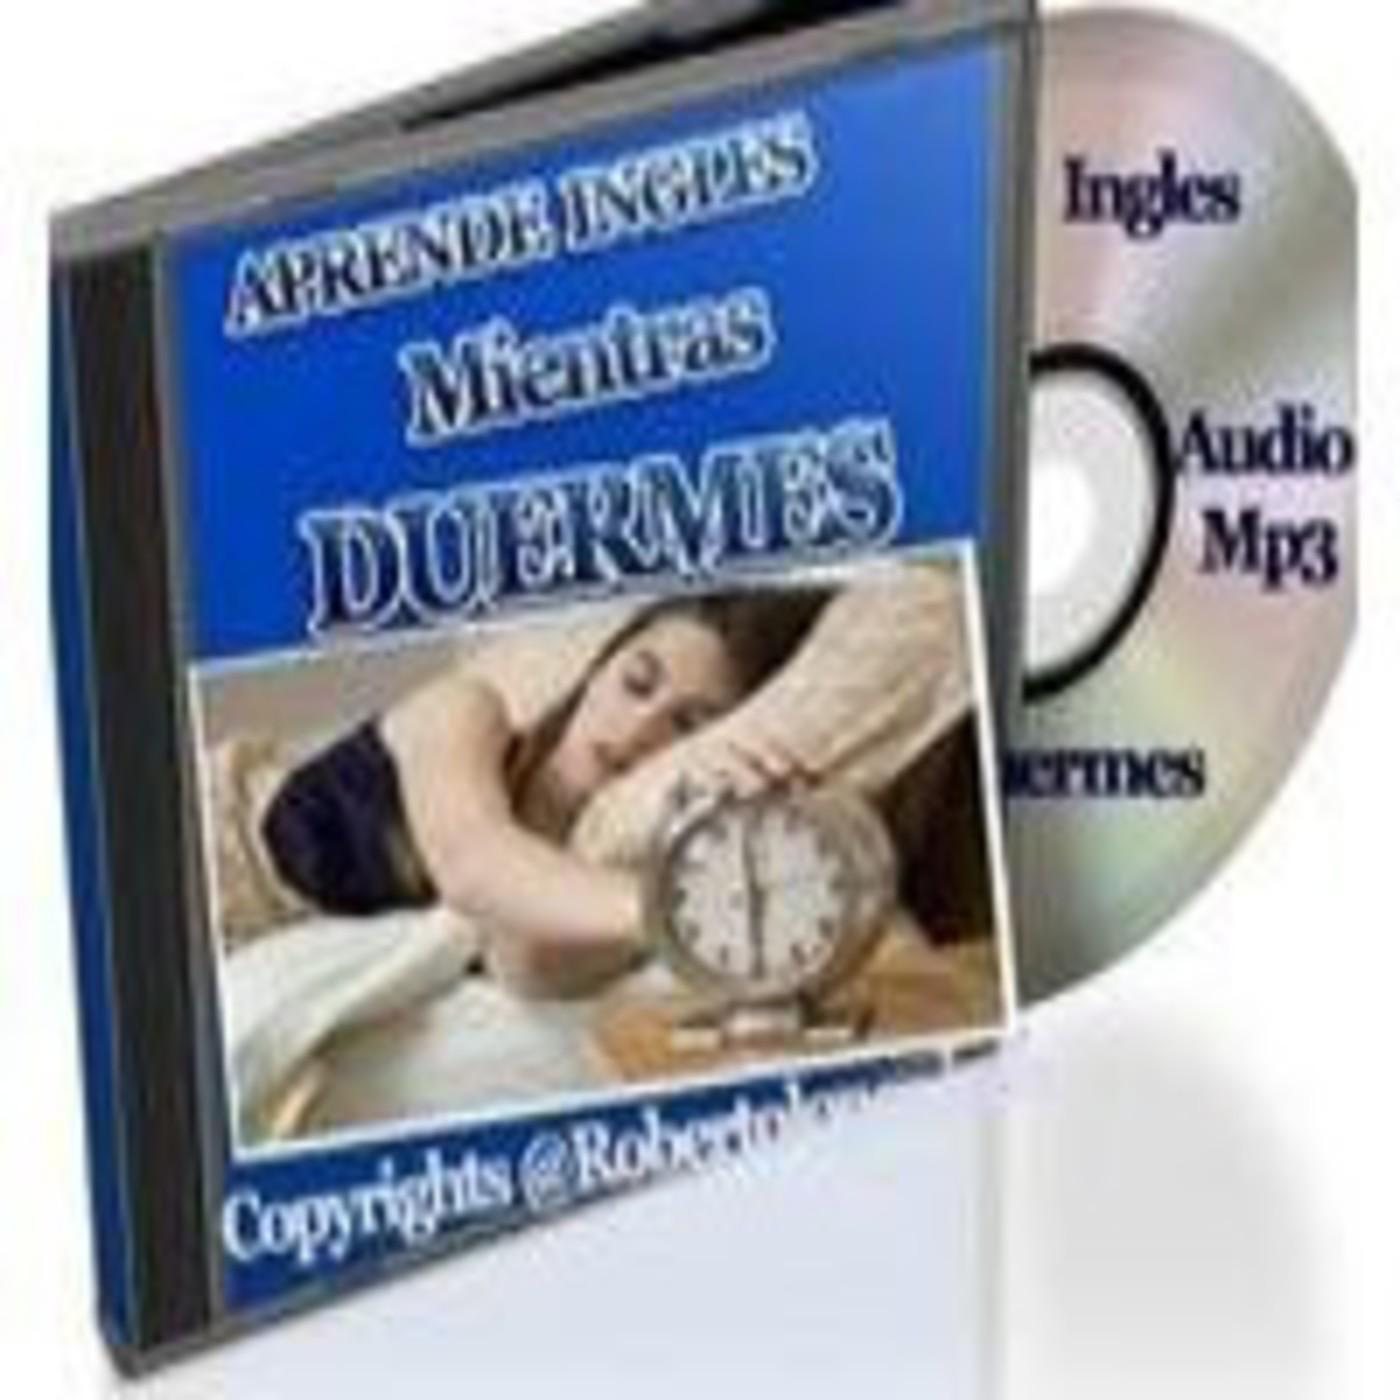 Aprende inglés mientras duermes - Hypnotics Spanglesh 1/2